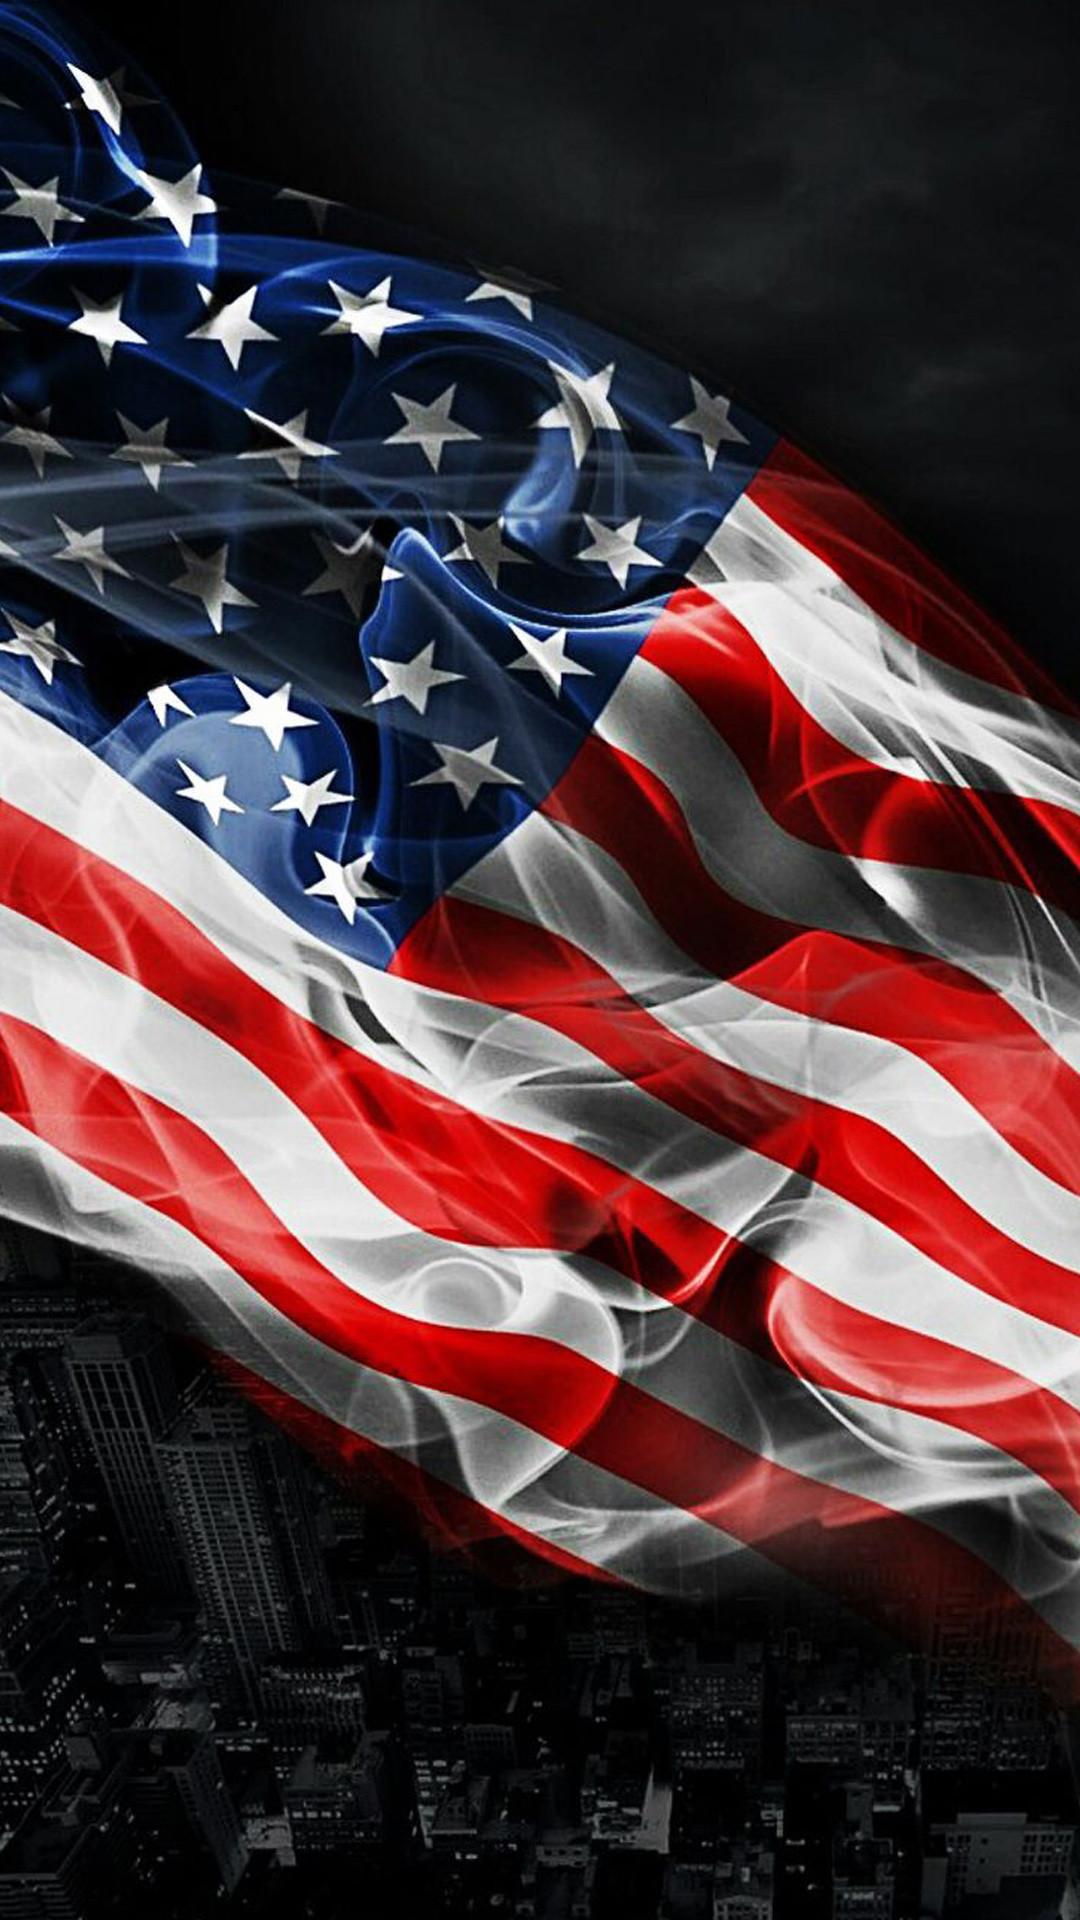 American Flag Wallpaper Images